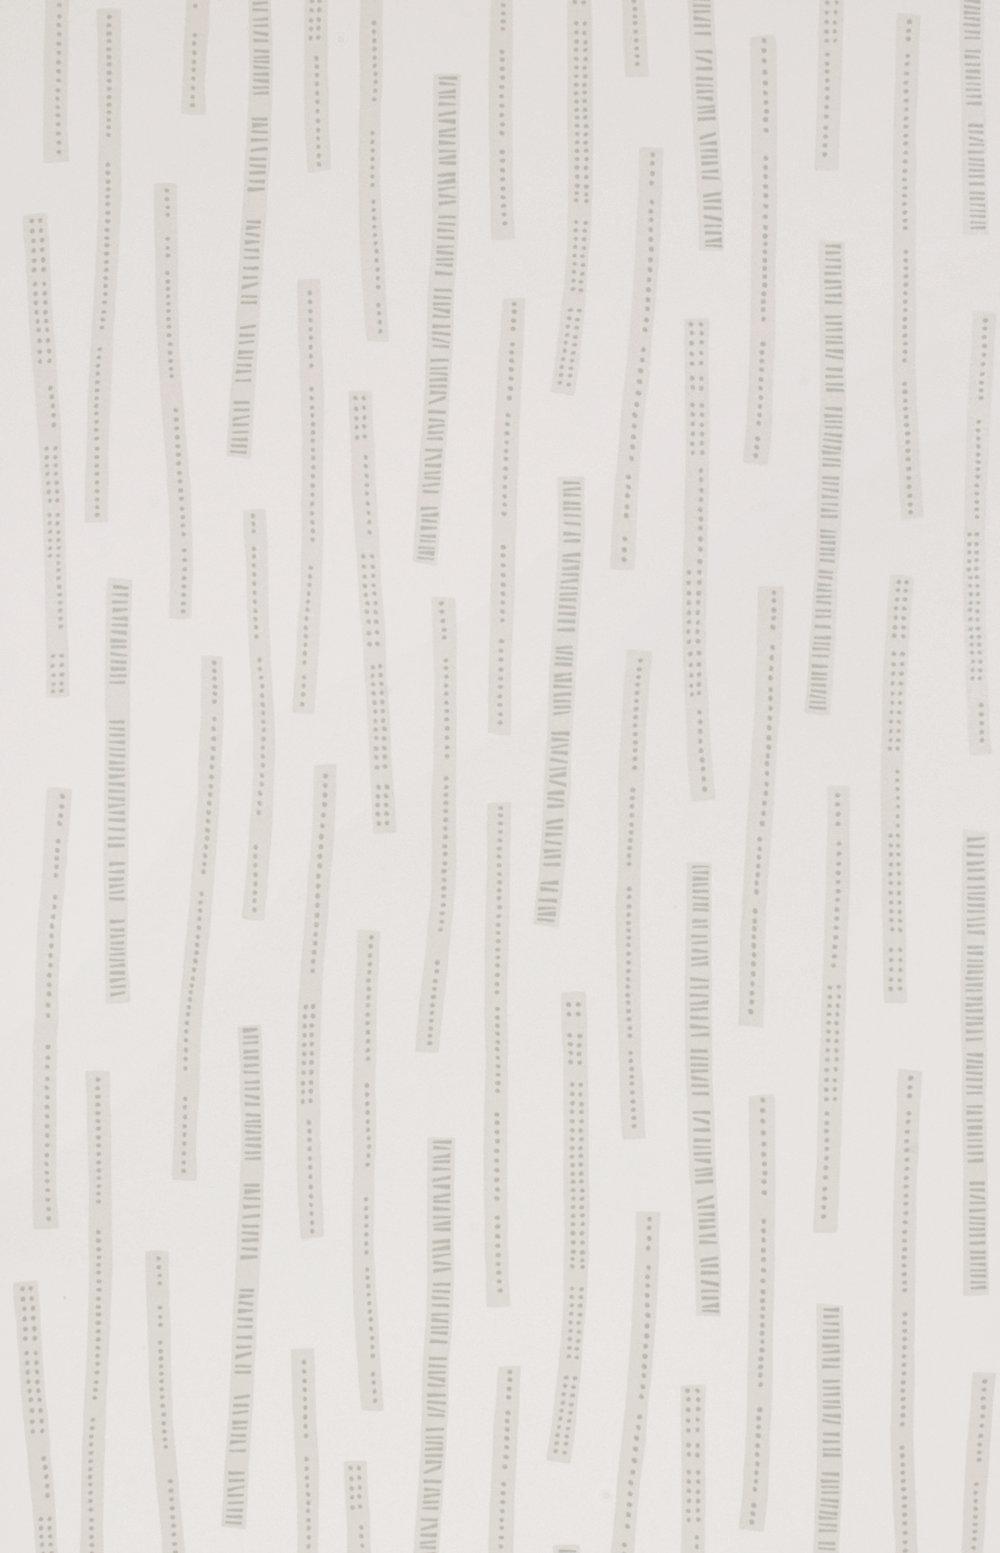 Miss Prints | Telegram Oyster